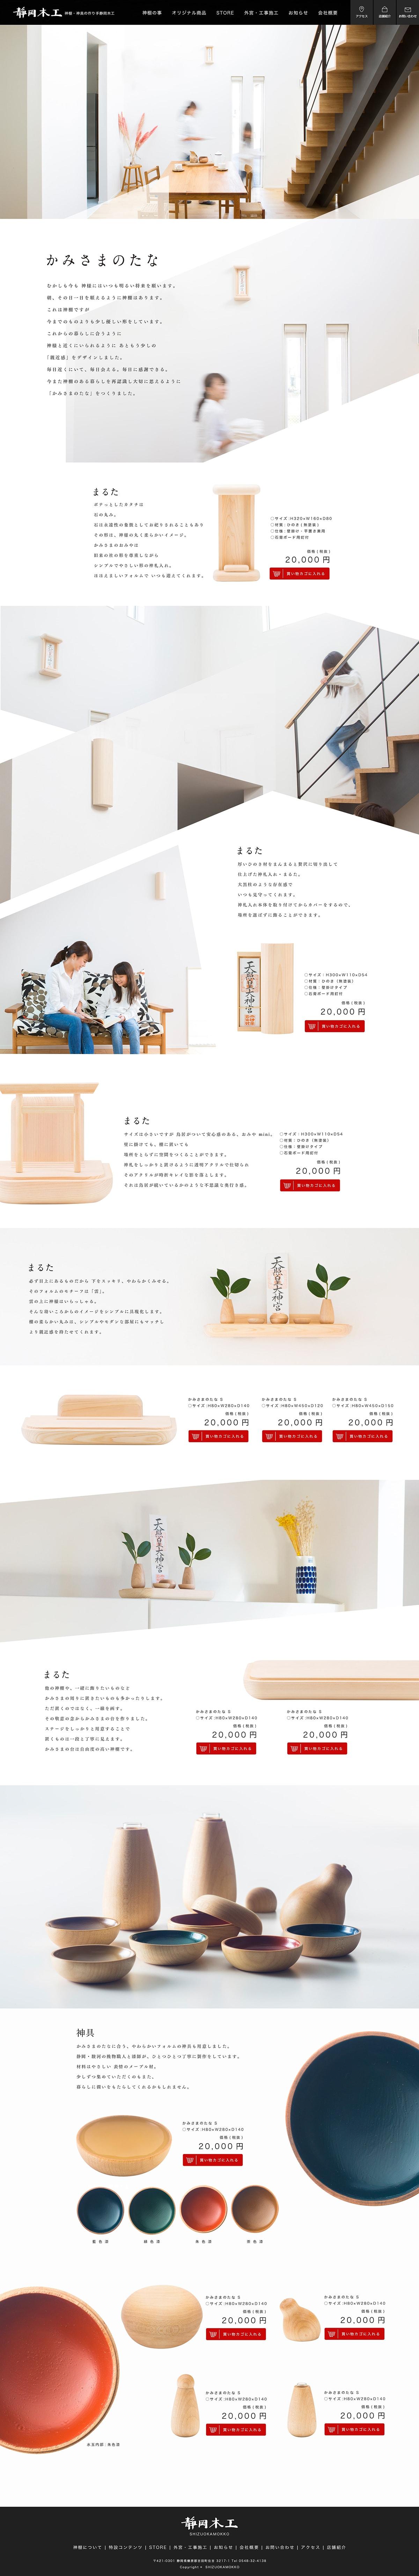 webdesign02